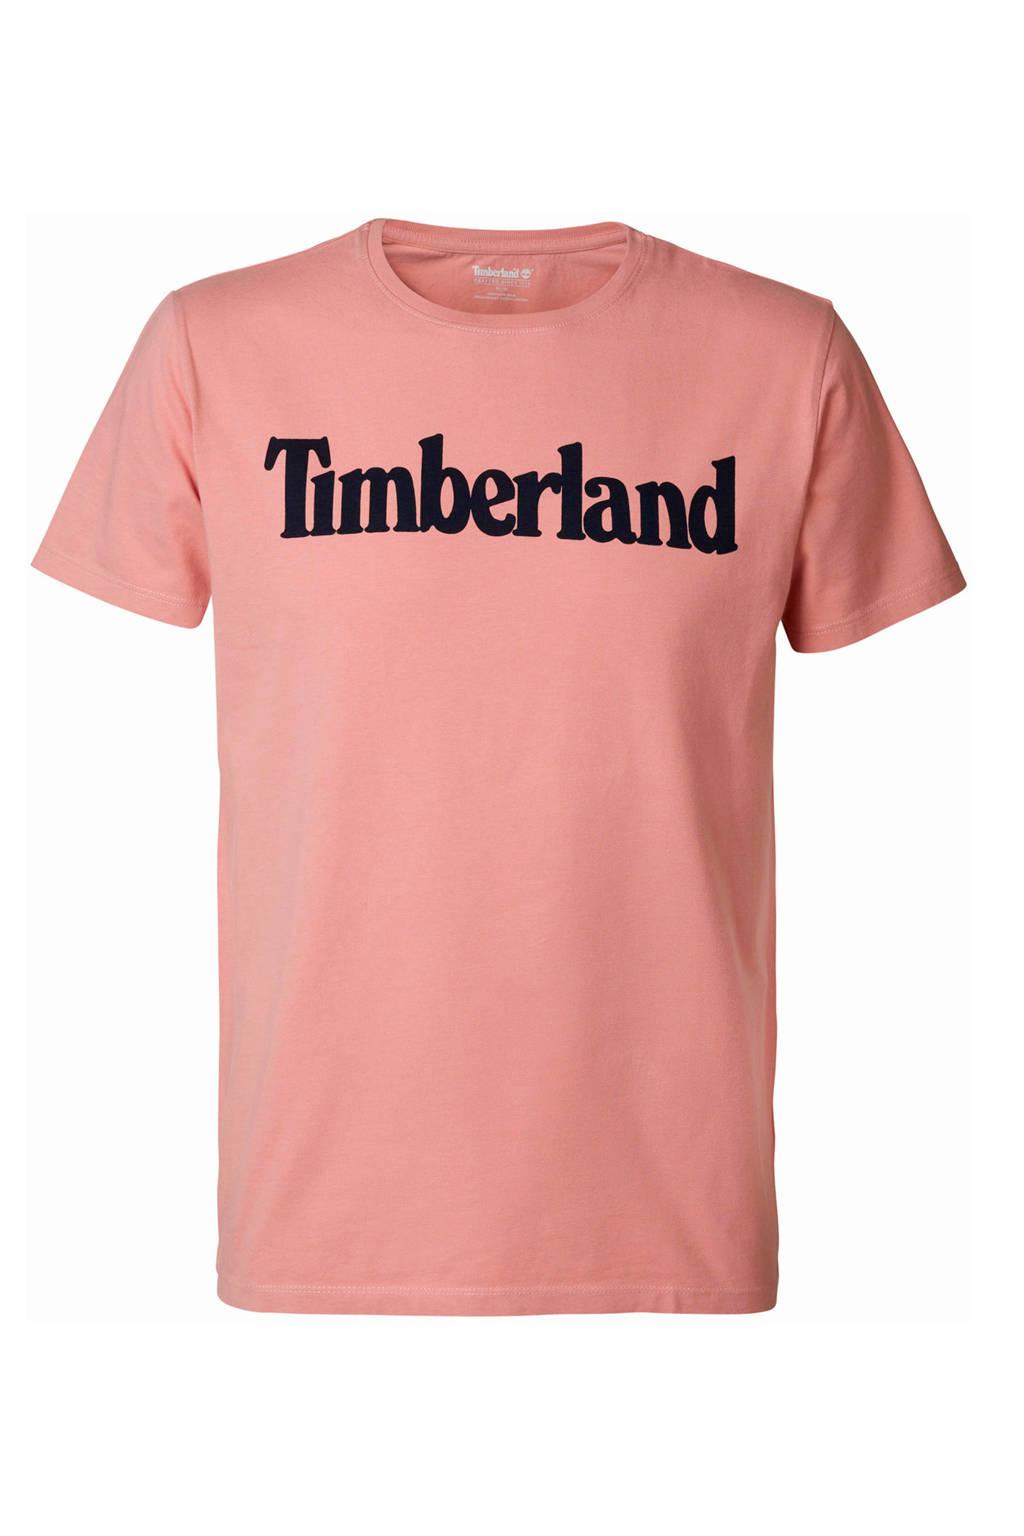 Timberland T-shirt met logo roze, Roze